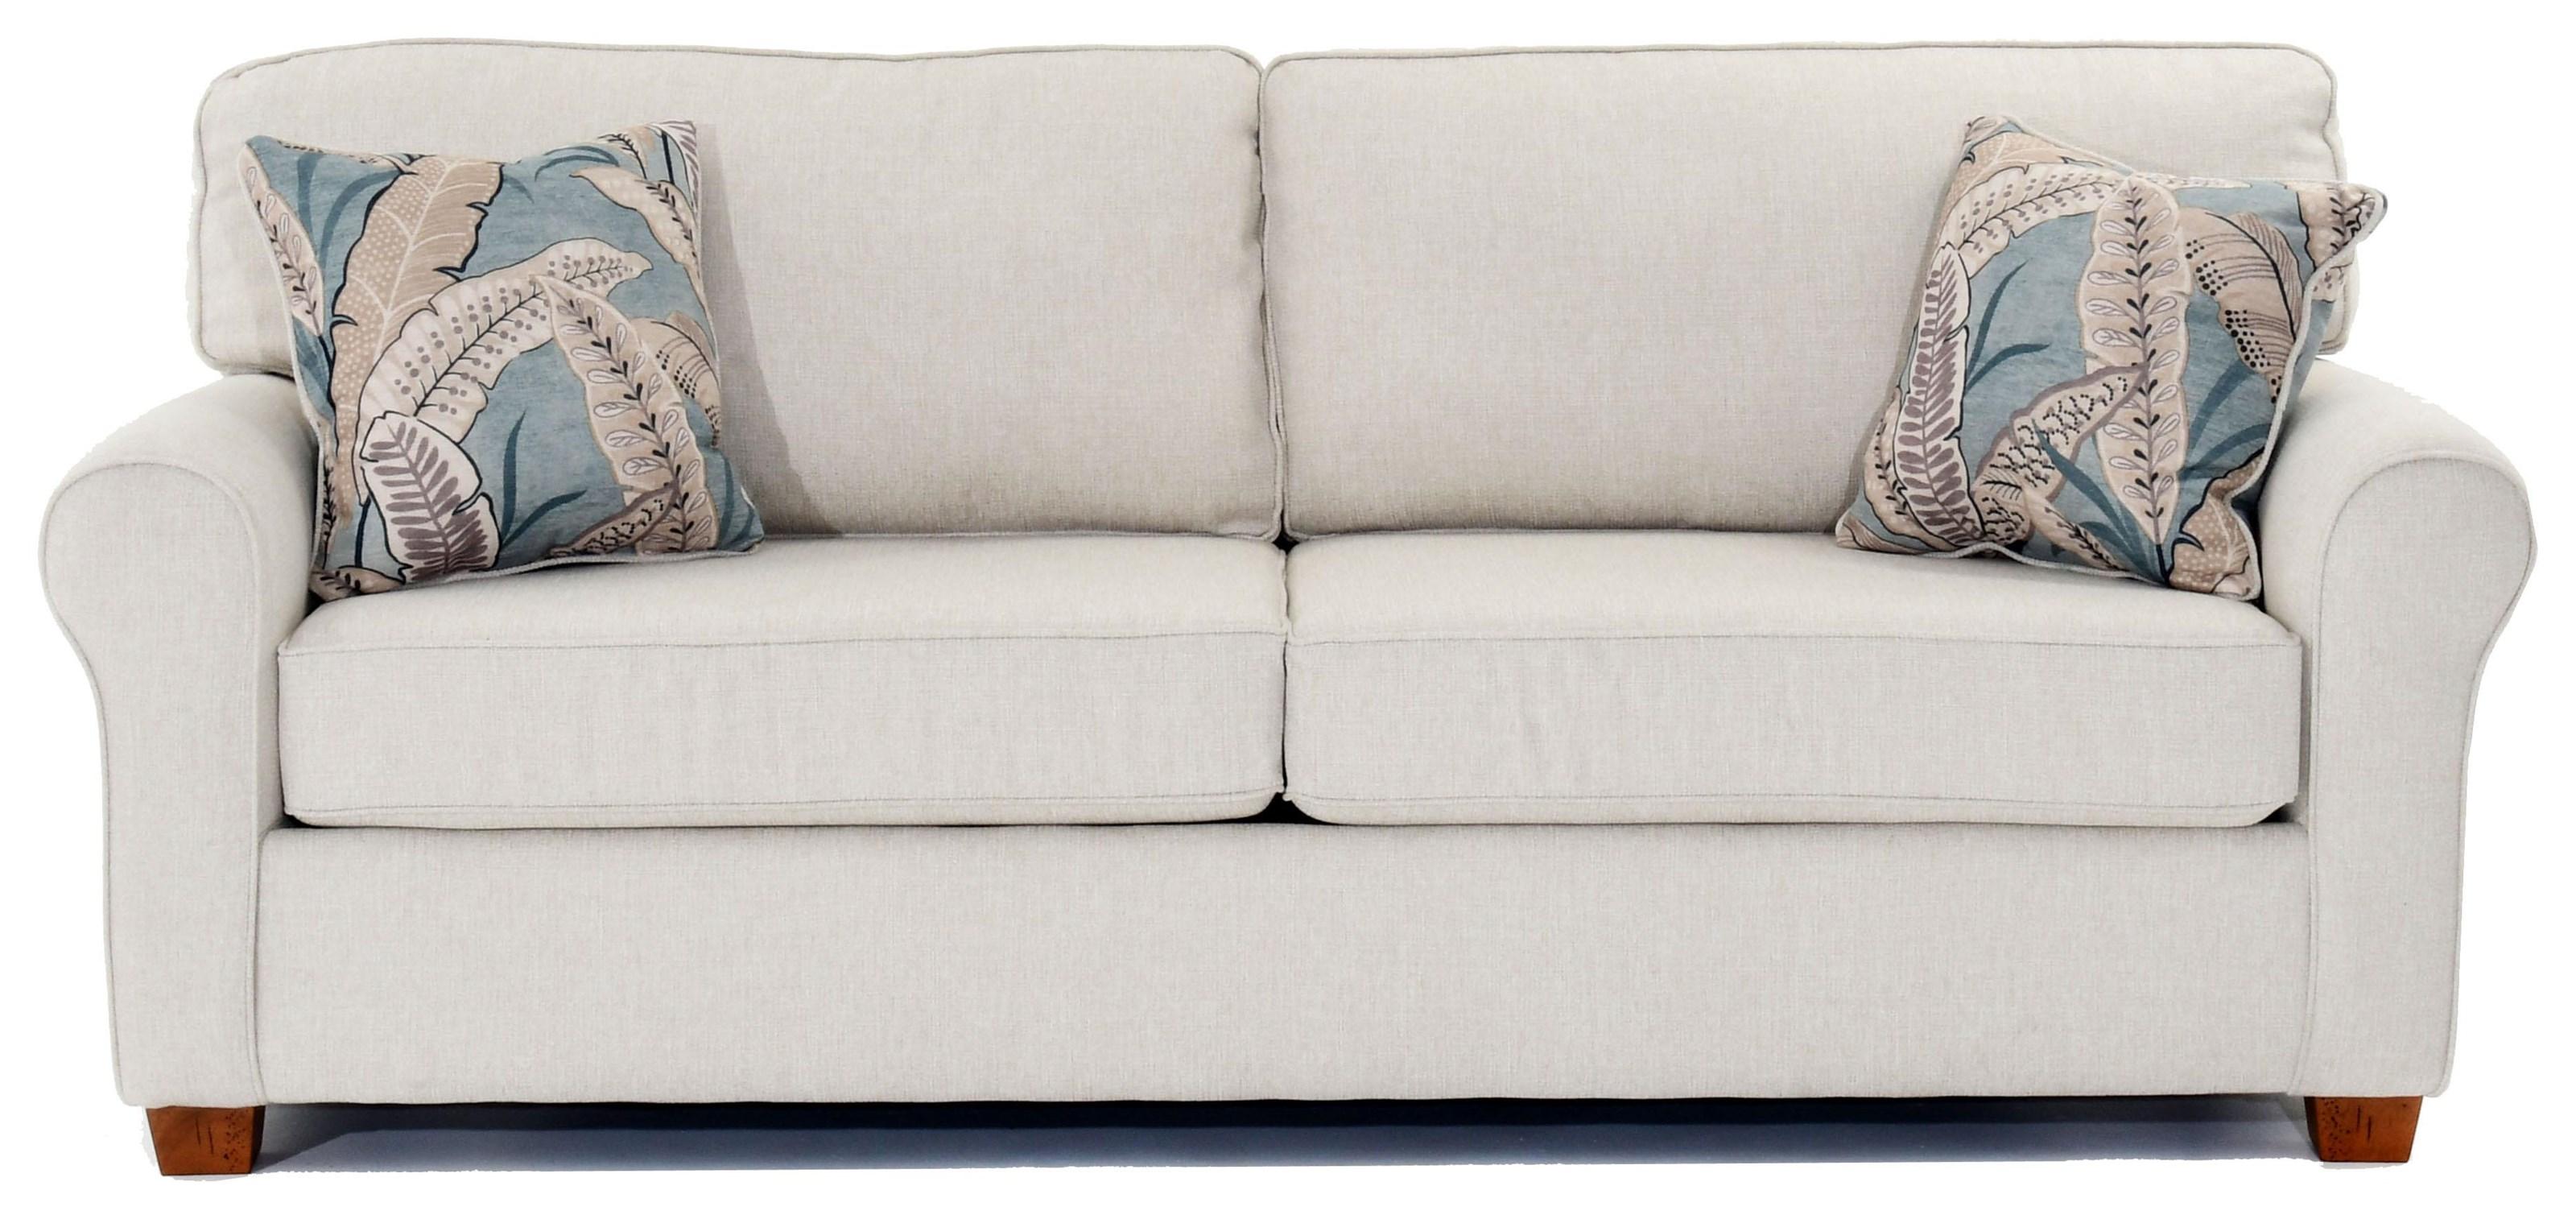 Best Home Furnishings Shannon S14aqdpsc Queen Sofa Sleeper